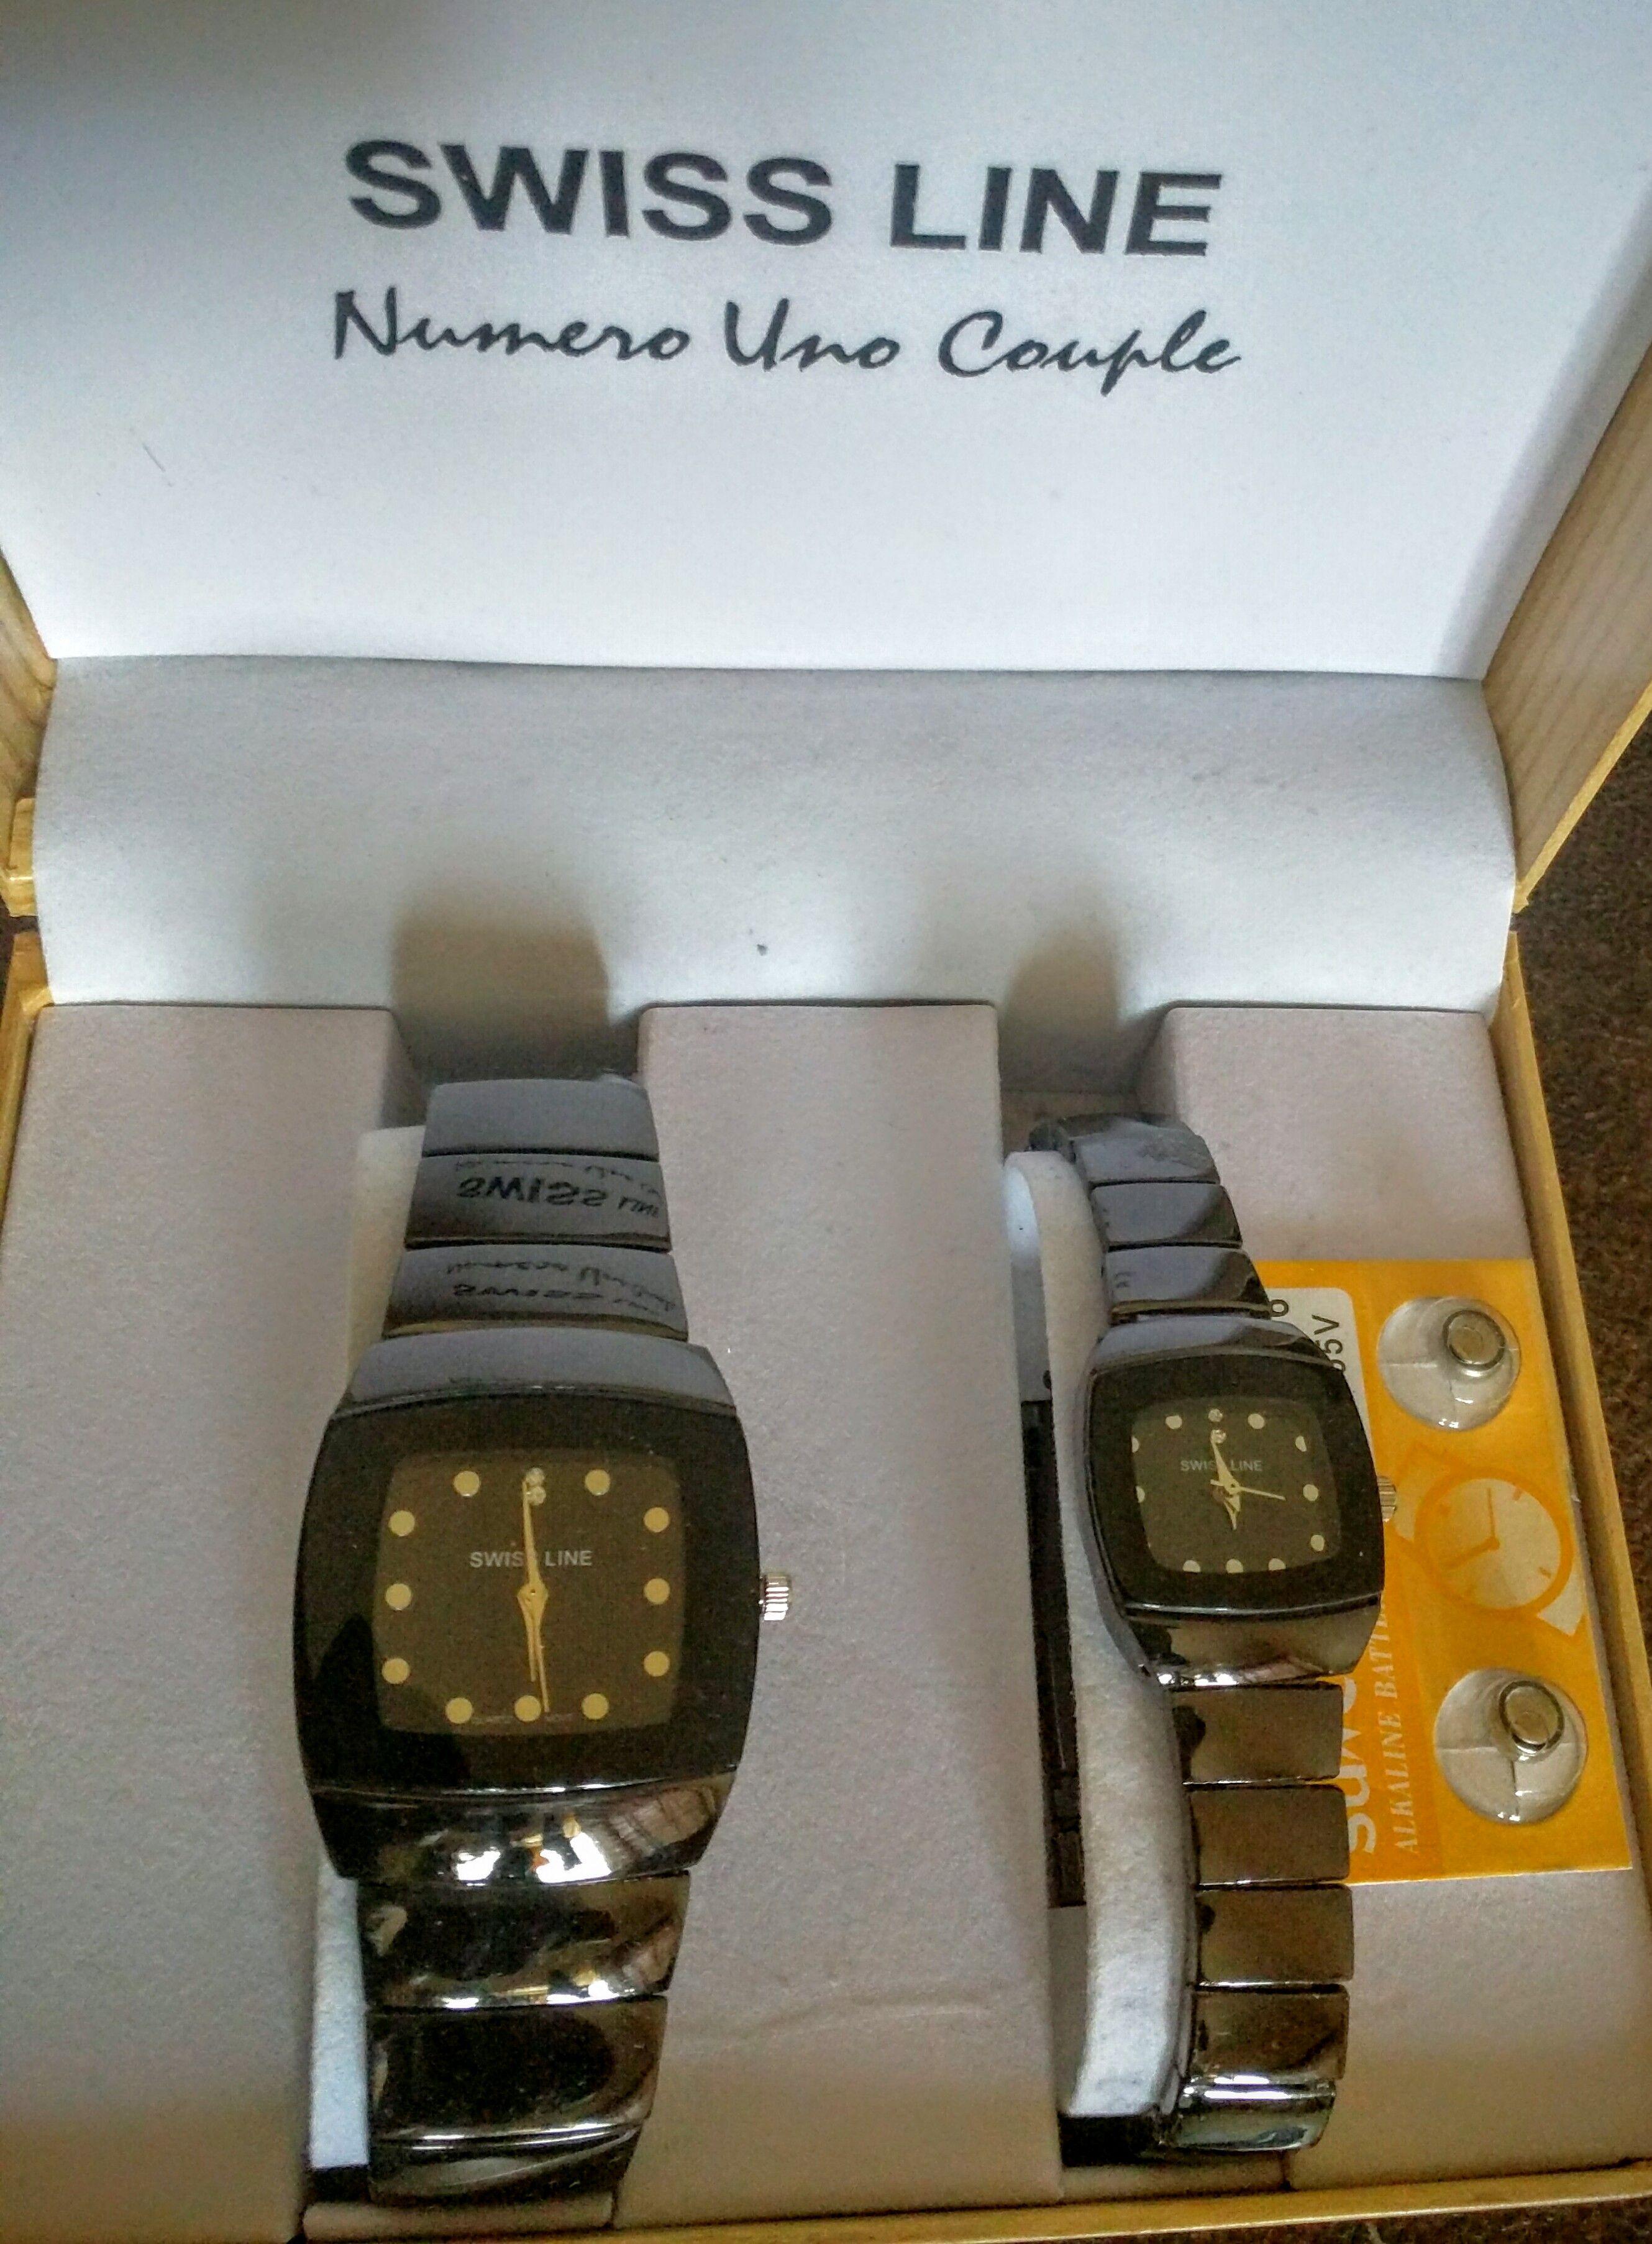 Swiss line numerous uno watches